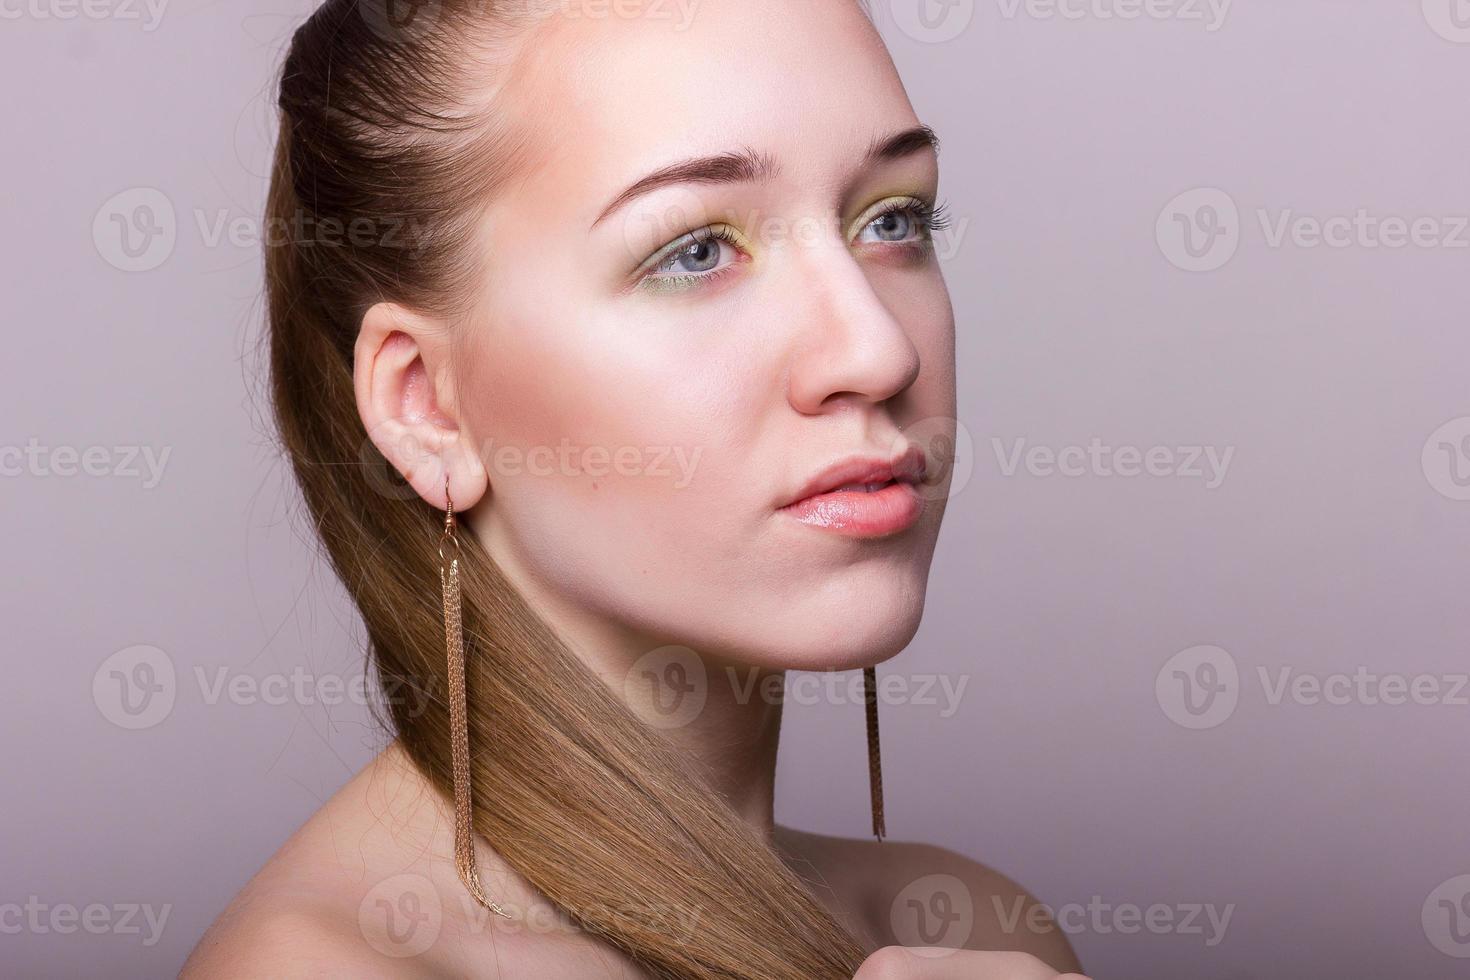 Studio beauty portrait of a beautiful young woman photo